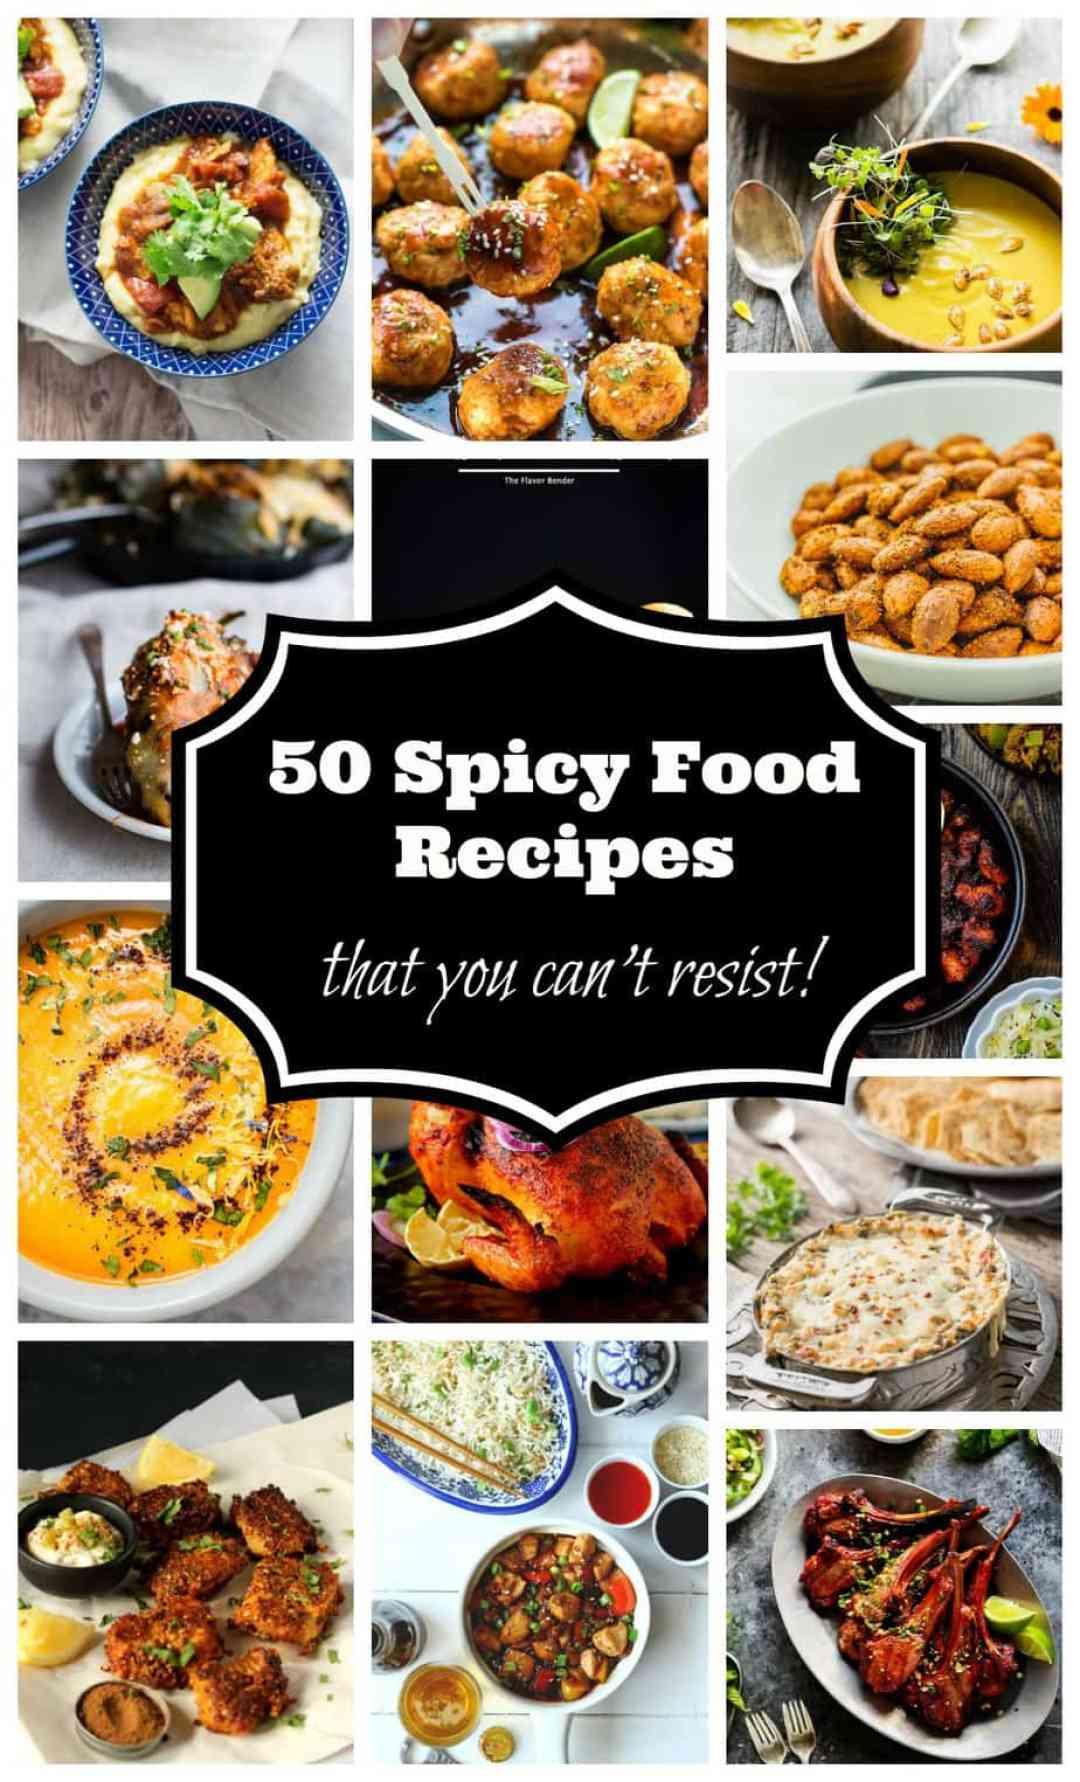 50 Spicy Food Recipes